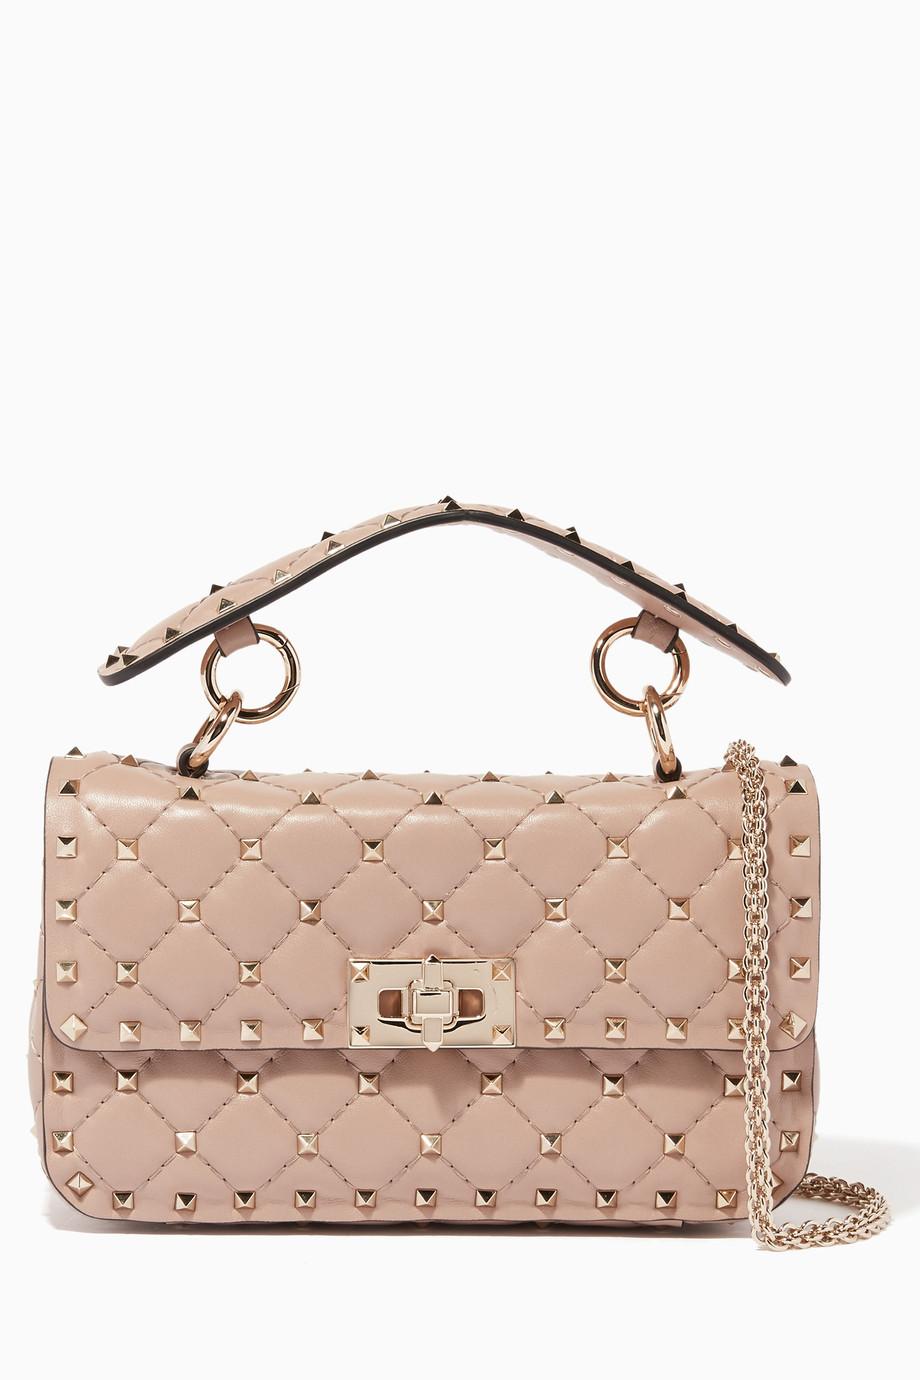 042fef38fee Shop Valentino Neutral Beige Small Rockstud Spike Matelasse Shoulder Bag  for Women | Ounass